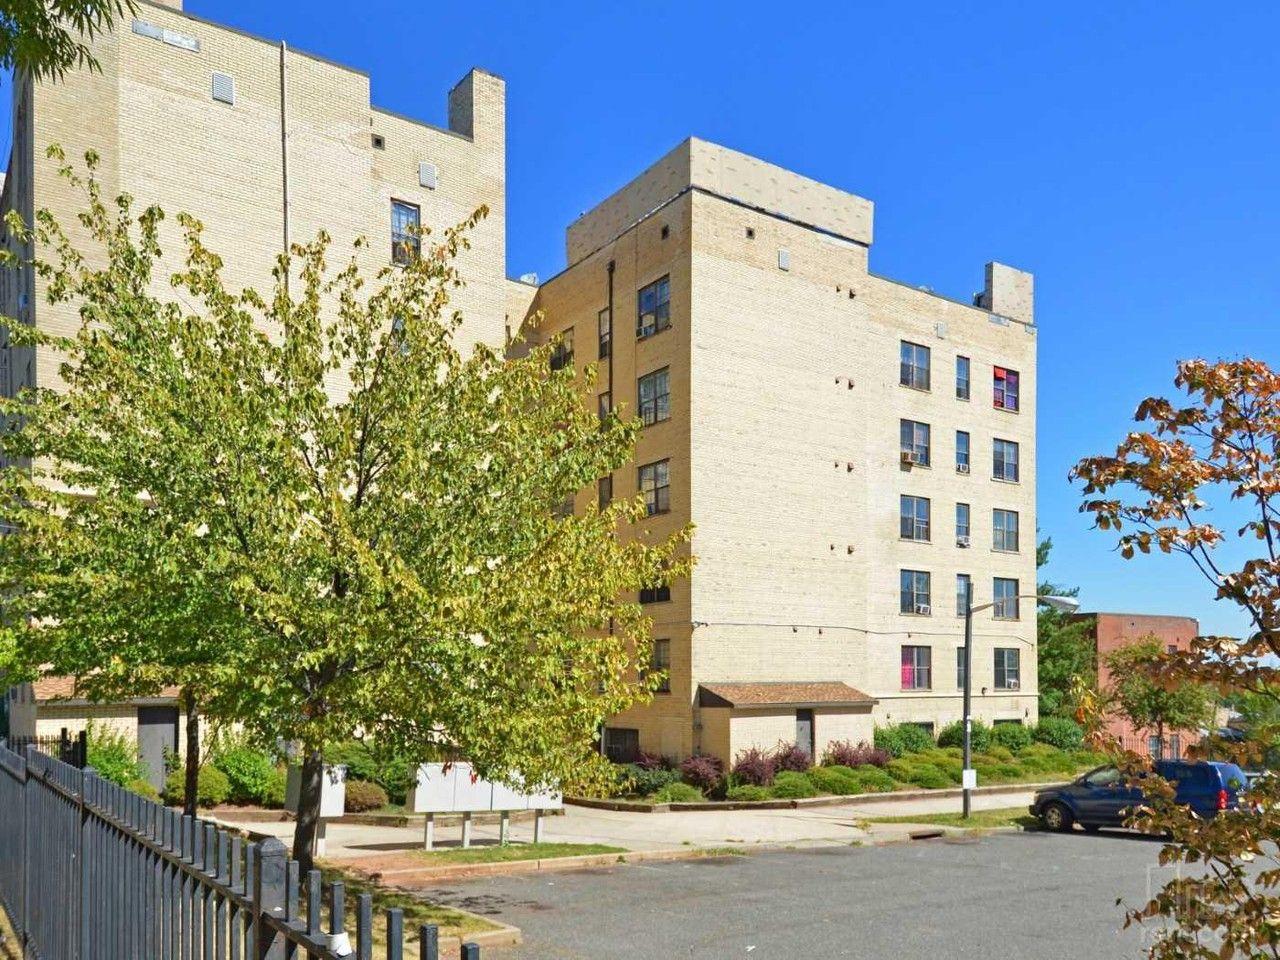 10 osborne terrace 1j newark nj 07108 3 bedroom - 3 bedroom apartments for rent in newark nj ...